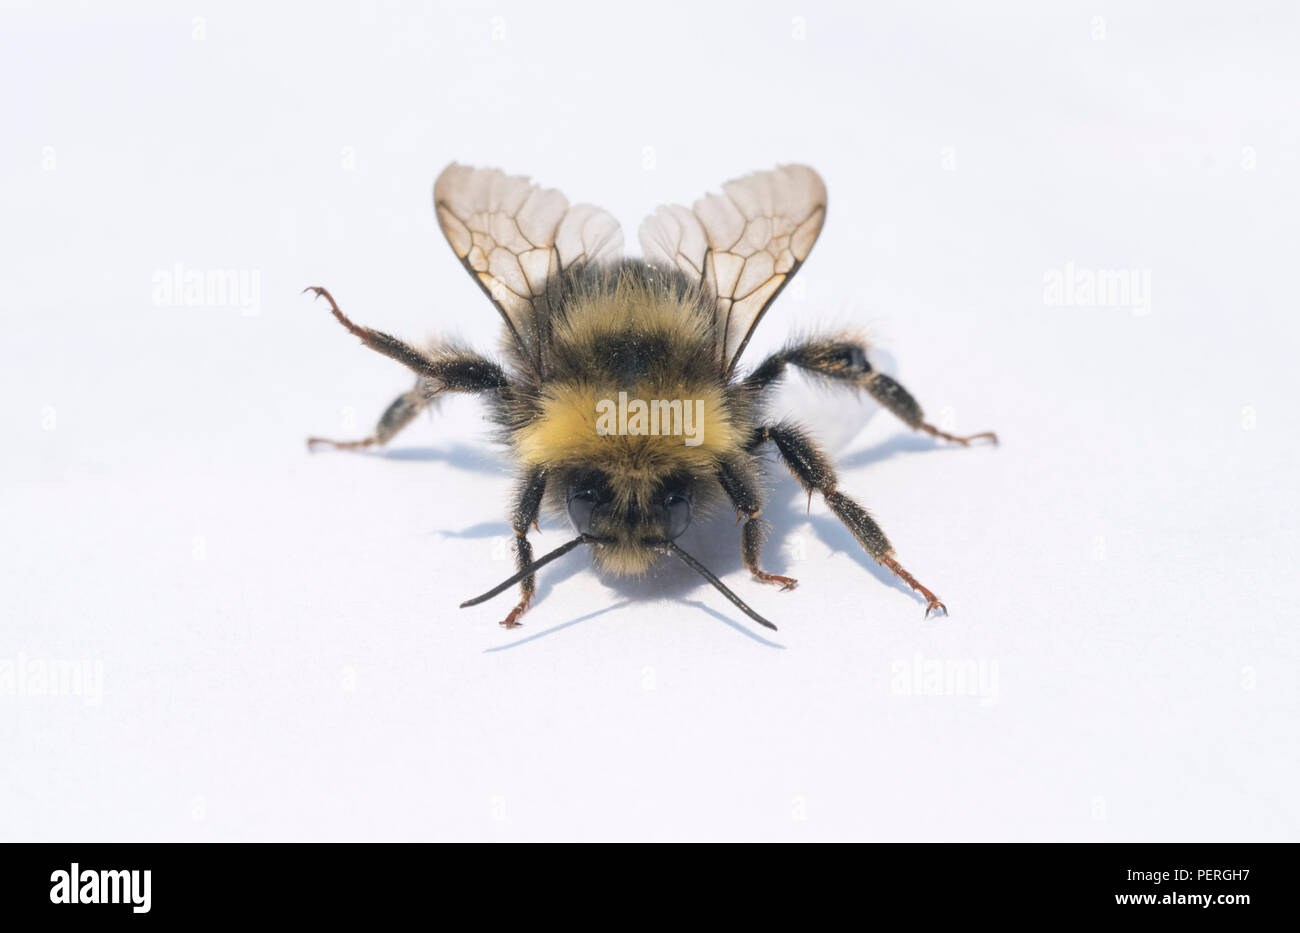 Western Bumblebee (Bombus occidentalis) Eye-level portrait of endangered insect - Stock Image